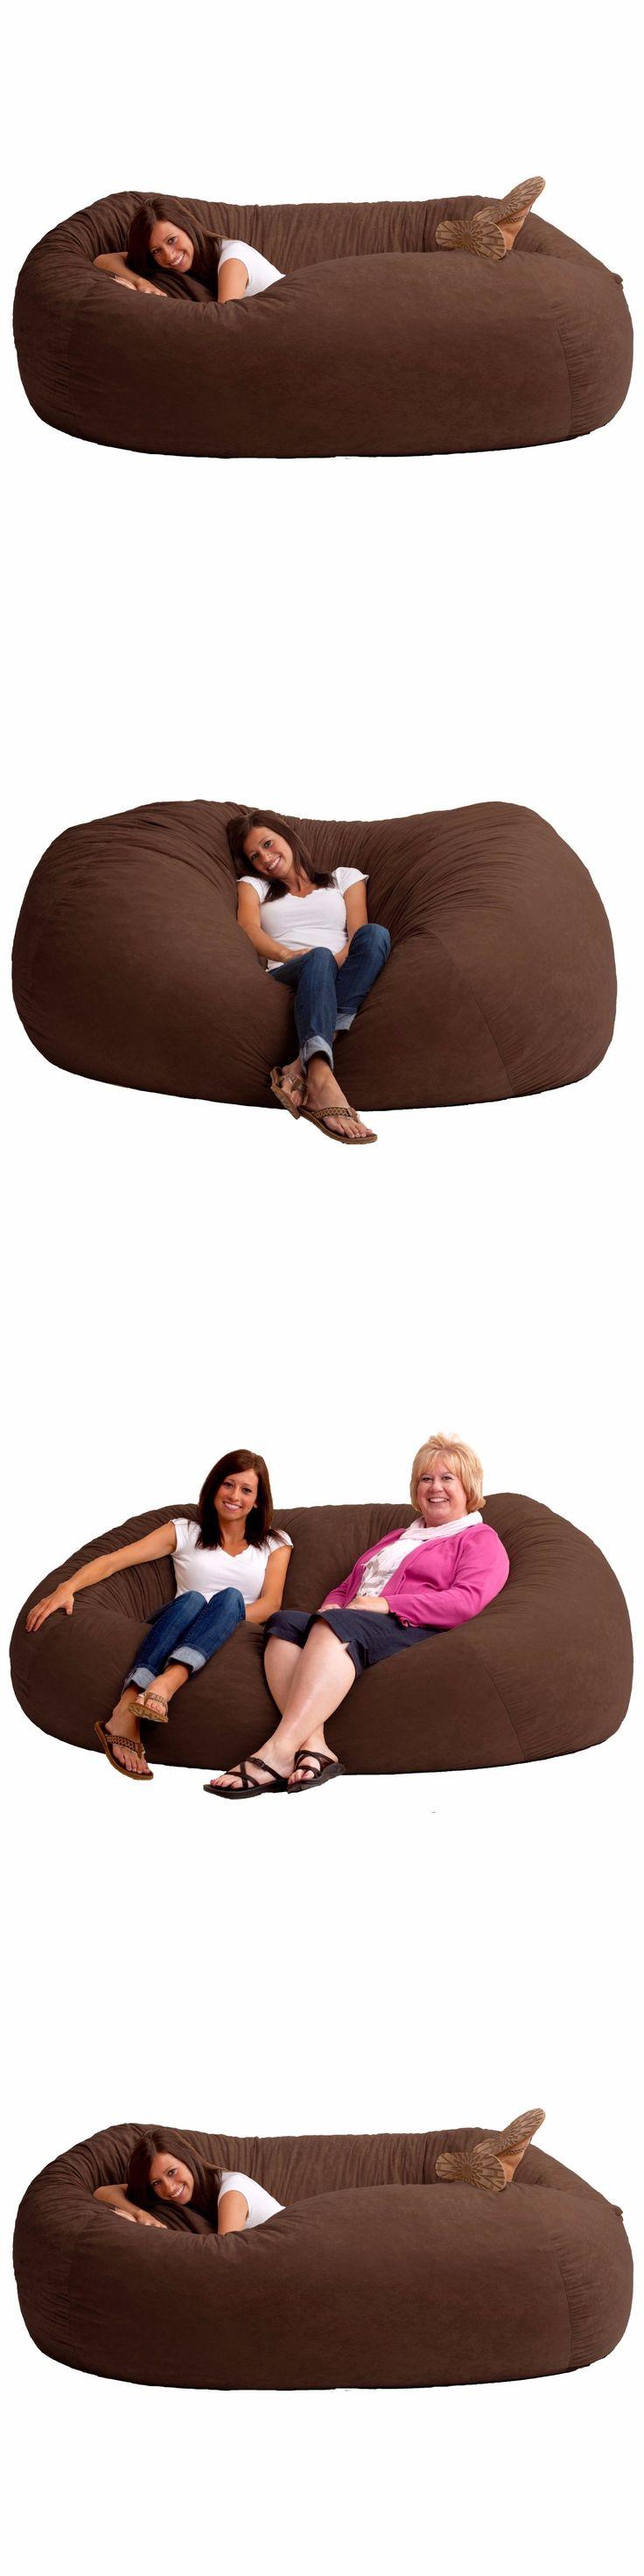 Big joe zip modular armless chair at brookstone buy now - Bean Bags And Inflatables 48319 Huge Bean Bag Ovesized Cheap 7ft Memory Foam Chair Sofa